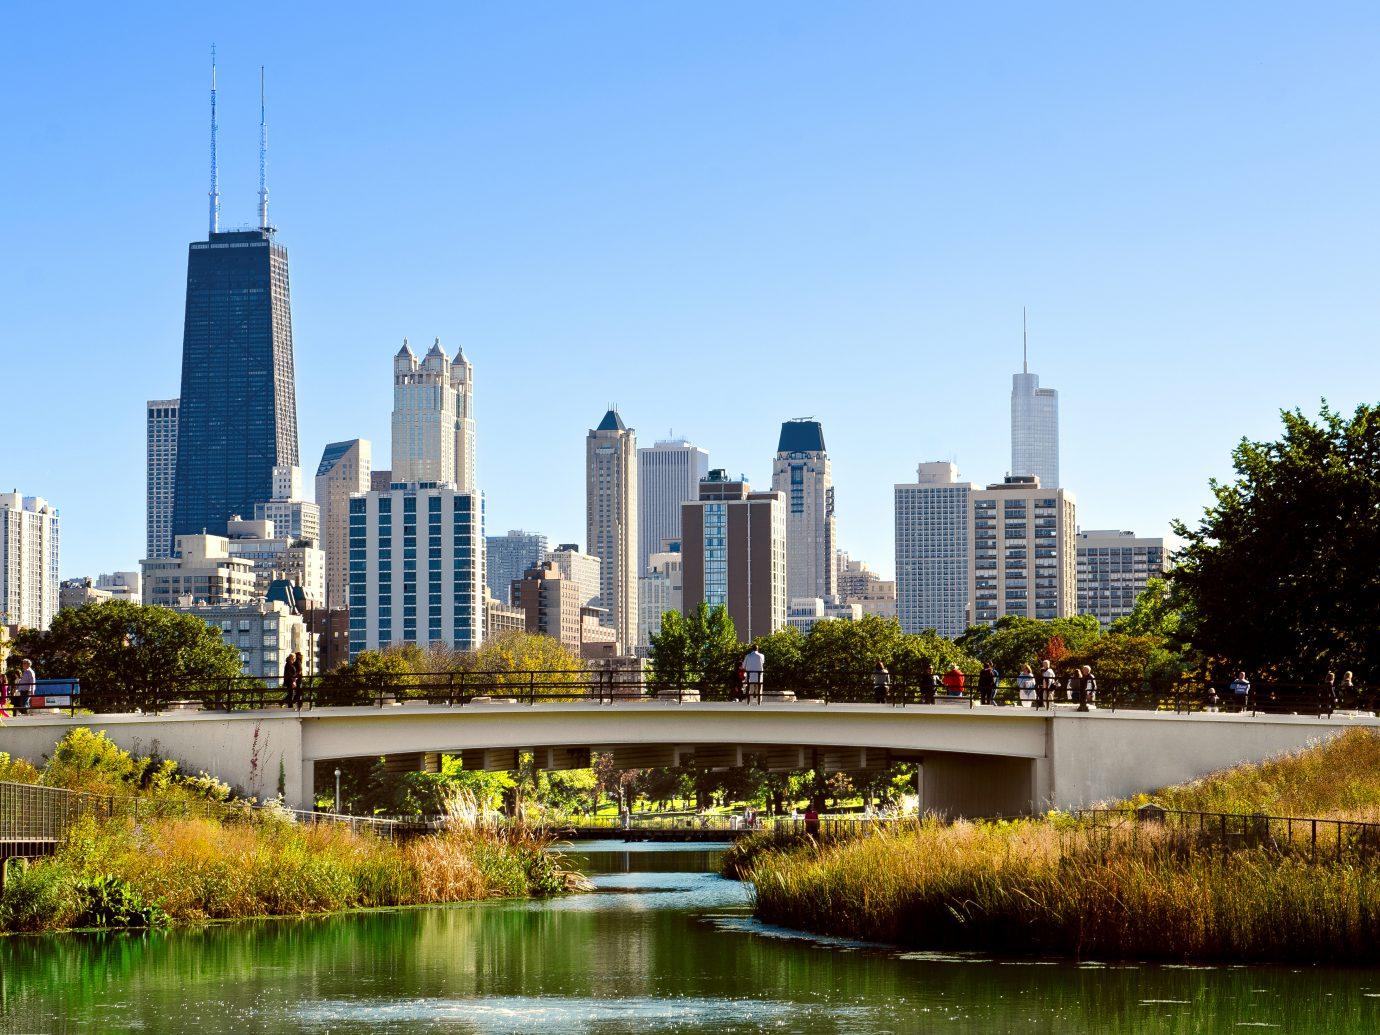 Bridge in Lincoln Park Neighborhood of Chicago